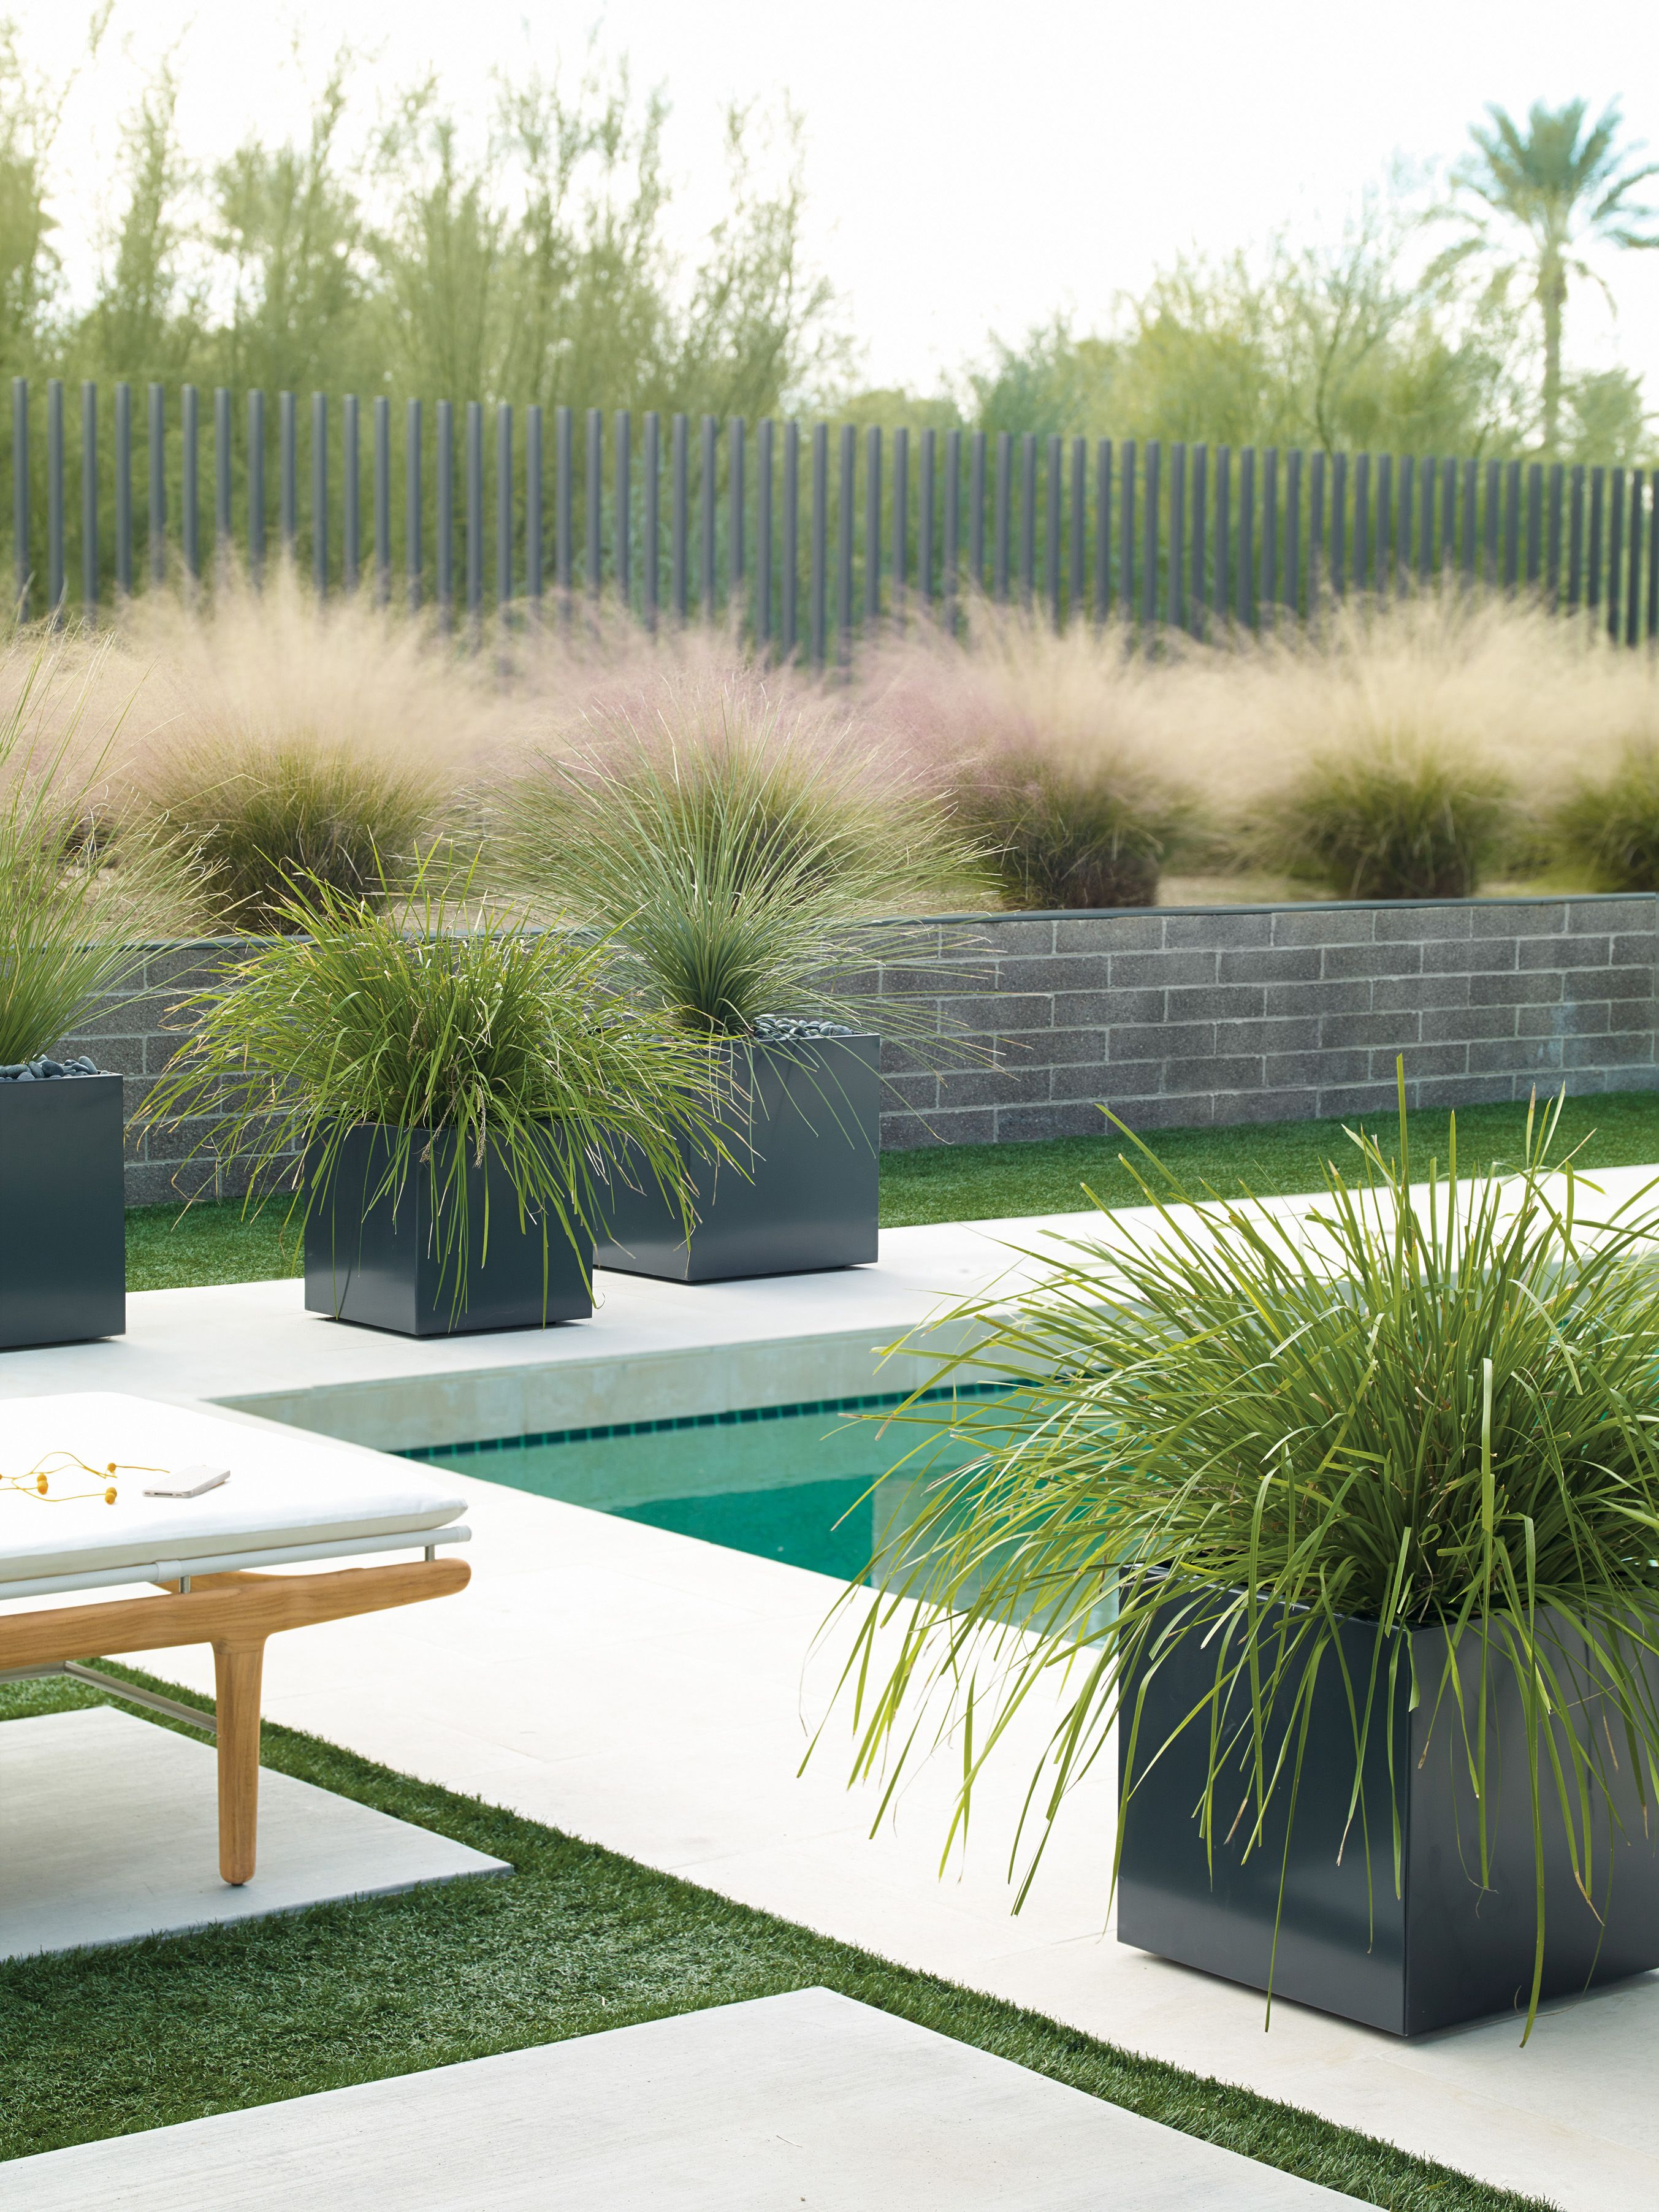 Planterworx arena square planters chris williams for Decoration jardin olivier